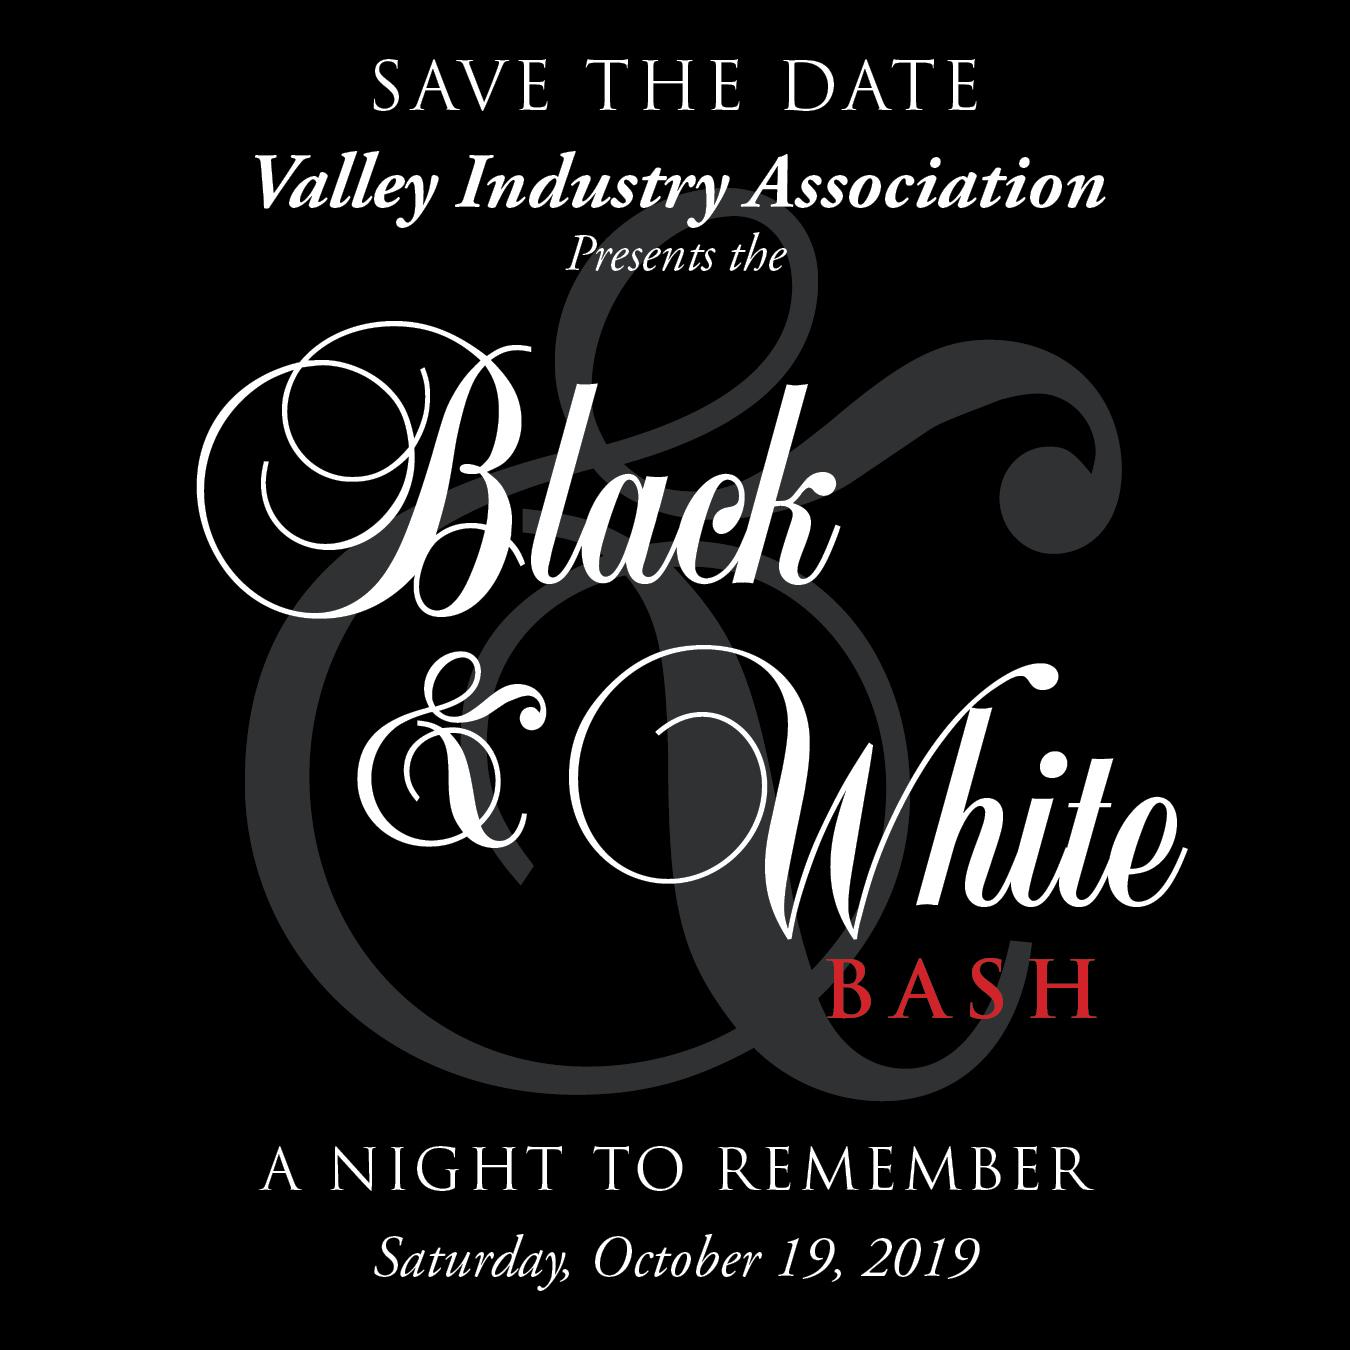 VIA BLACK & WHITE BASH   Cocktails:  7:00 p.m.     Dinner:  8:00 p.m. @ Hyatt Regency Valencia | Santa Clarita | California | United States